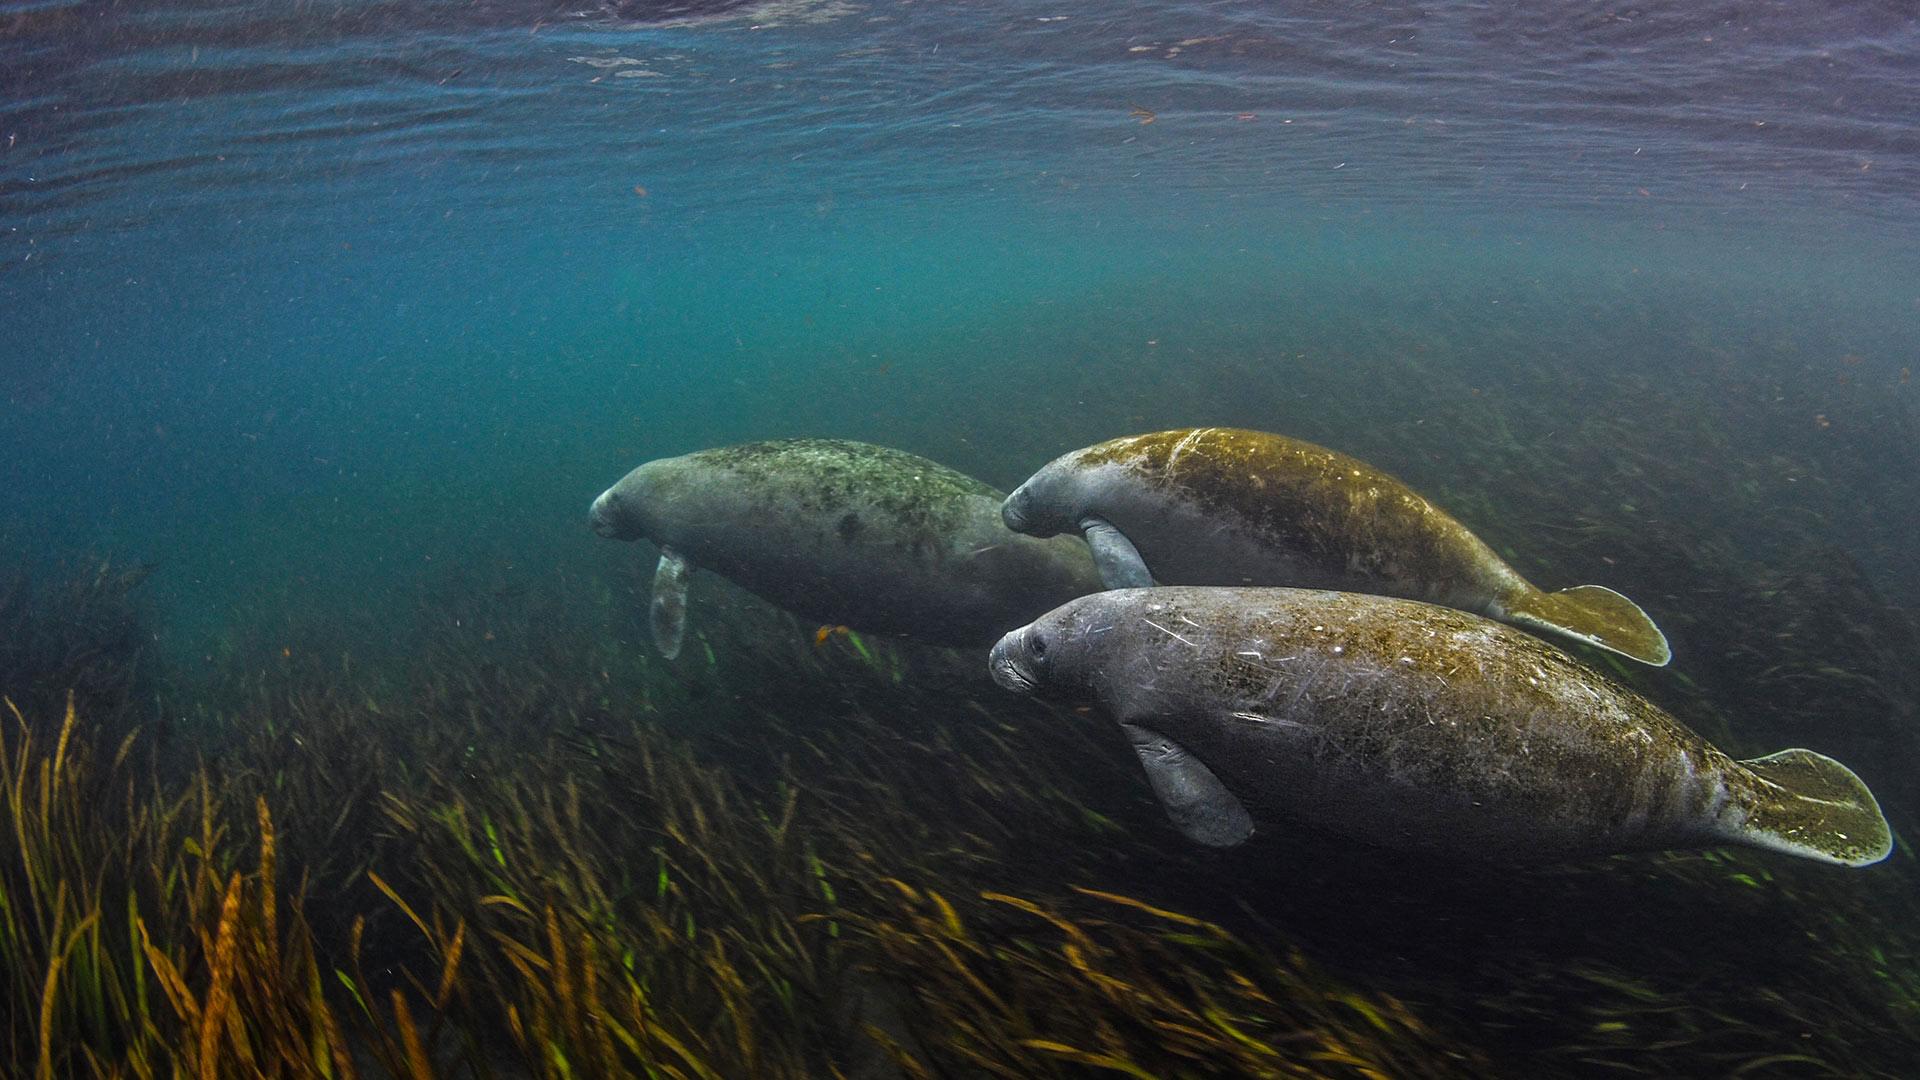 Manatees in the Ichetucknee River in Florida (© Jennifer Adler/Alamy)(Bing United States)